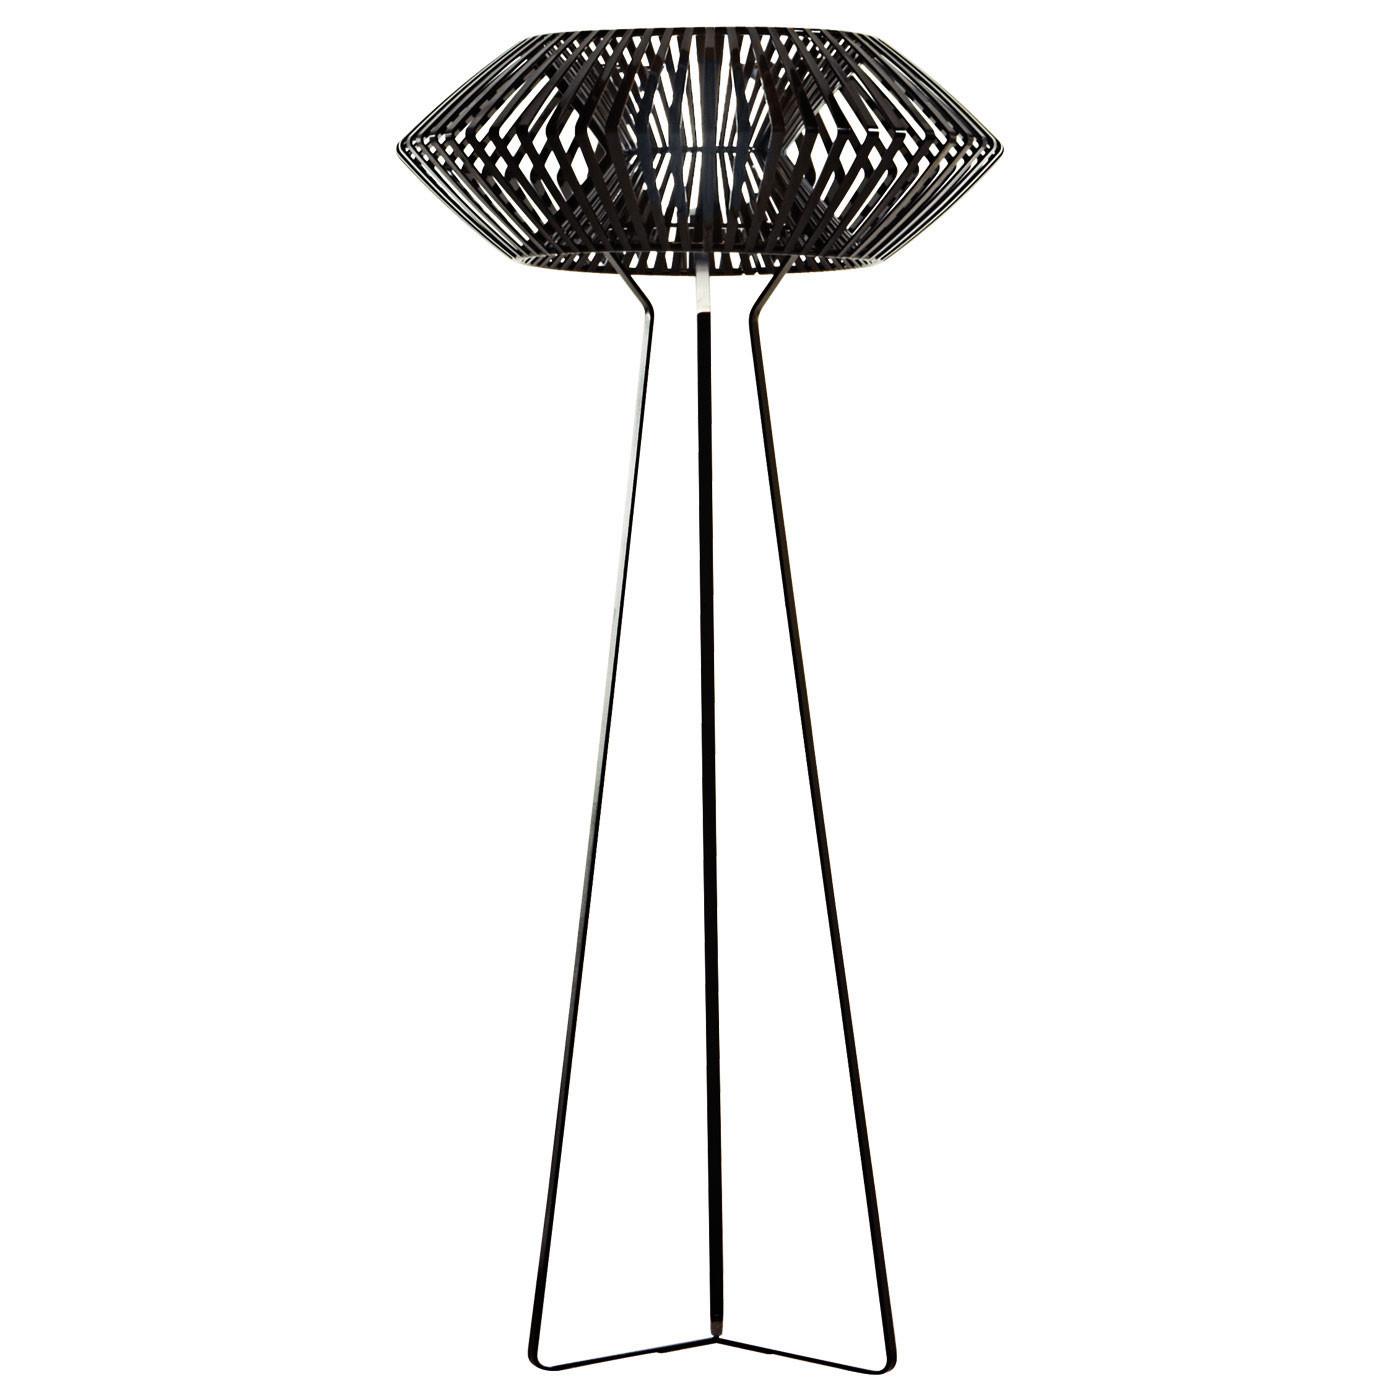 Arturo Alvarez V VV03 Floor Lamp